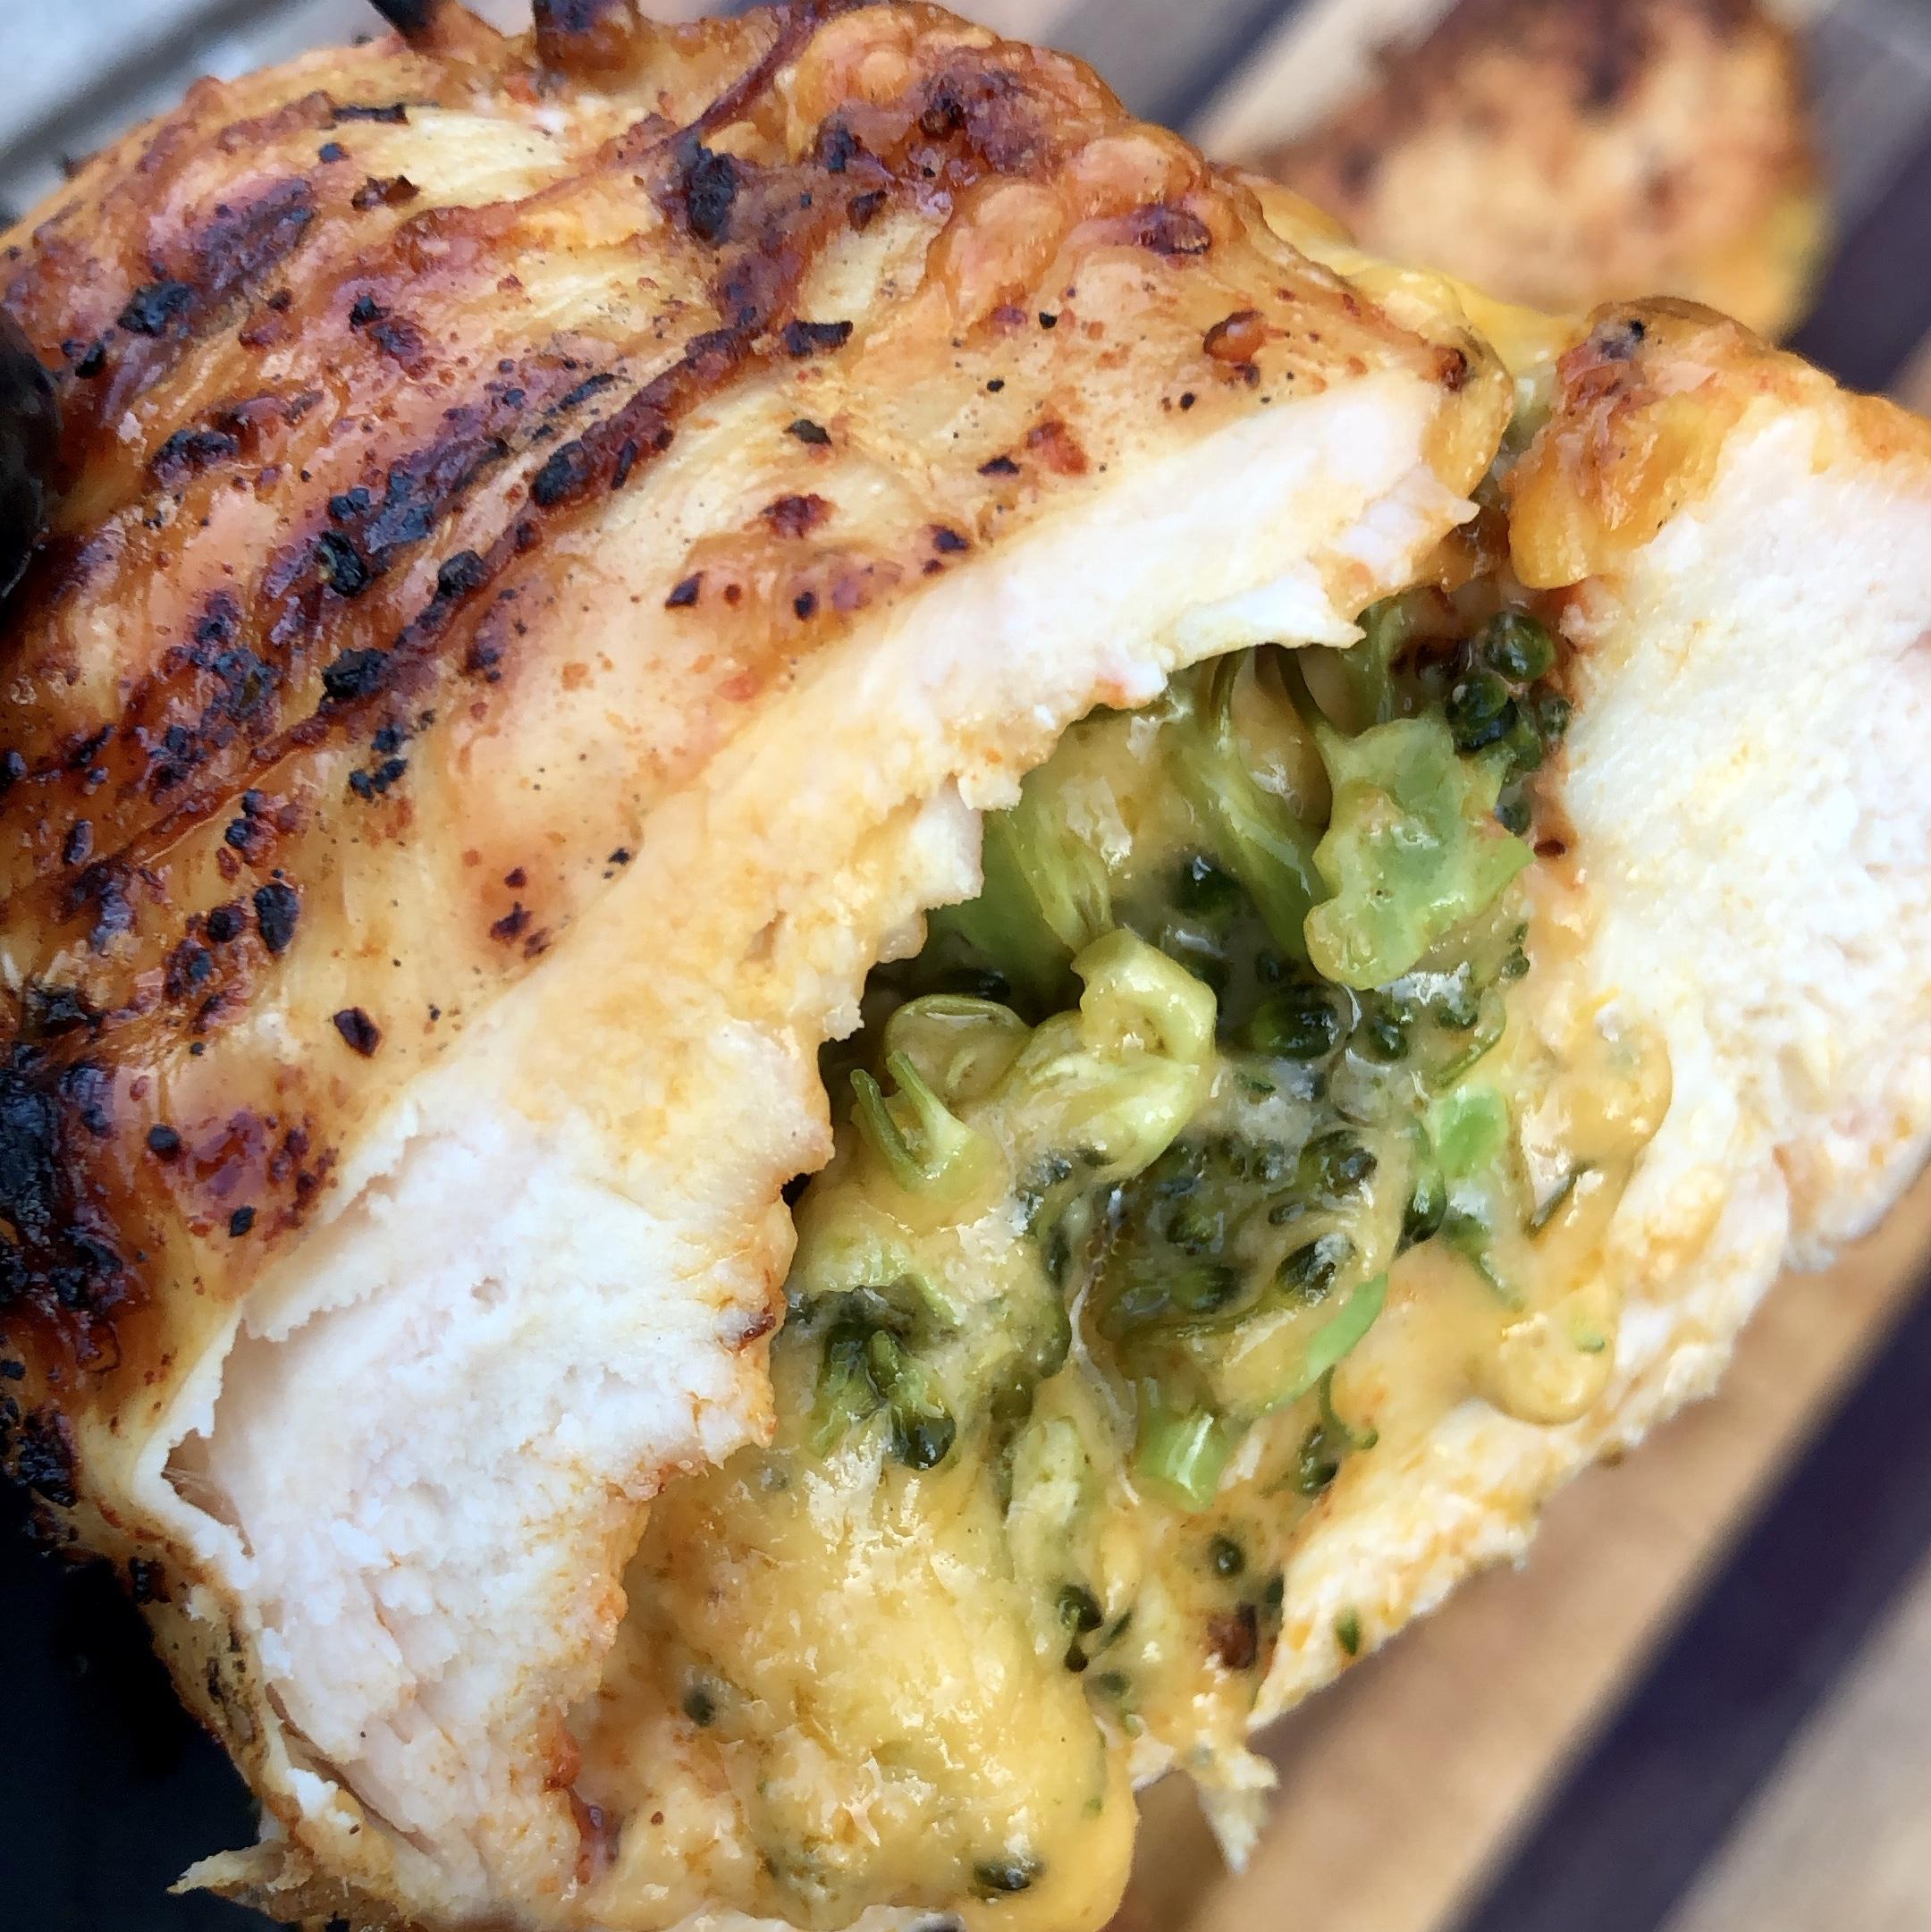 Broccoli And Cheddar Stuffed Chicken Breast Recipe Grillin With Dad